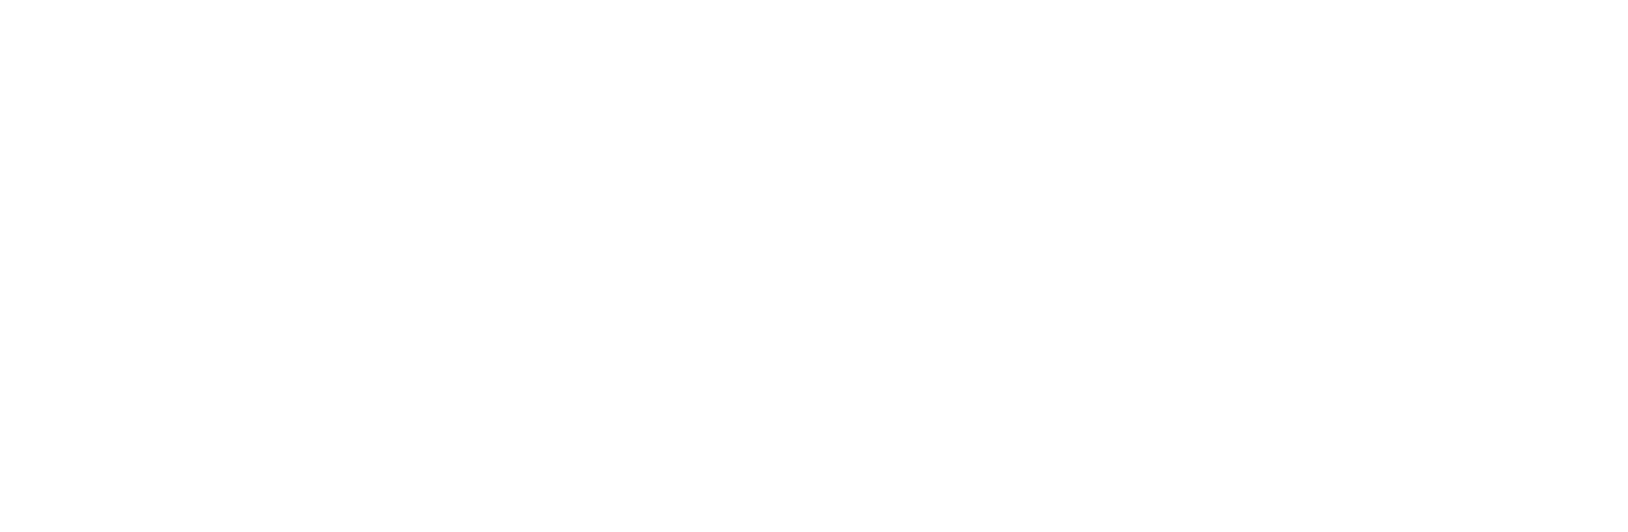 Leadership & Management, Mitchell College